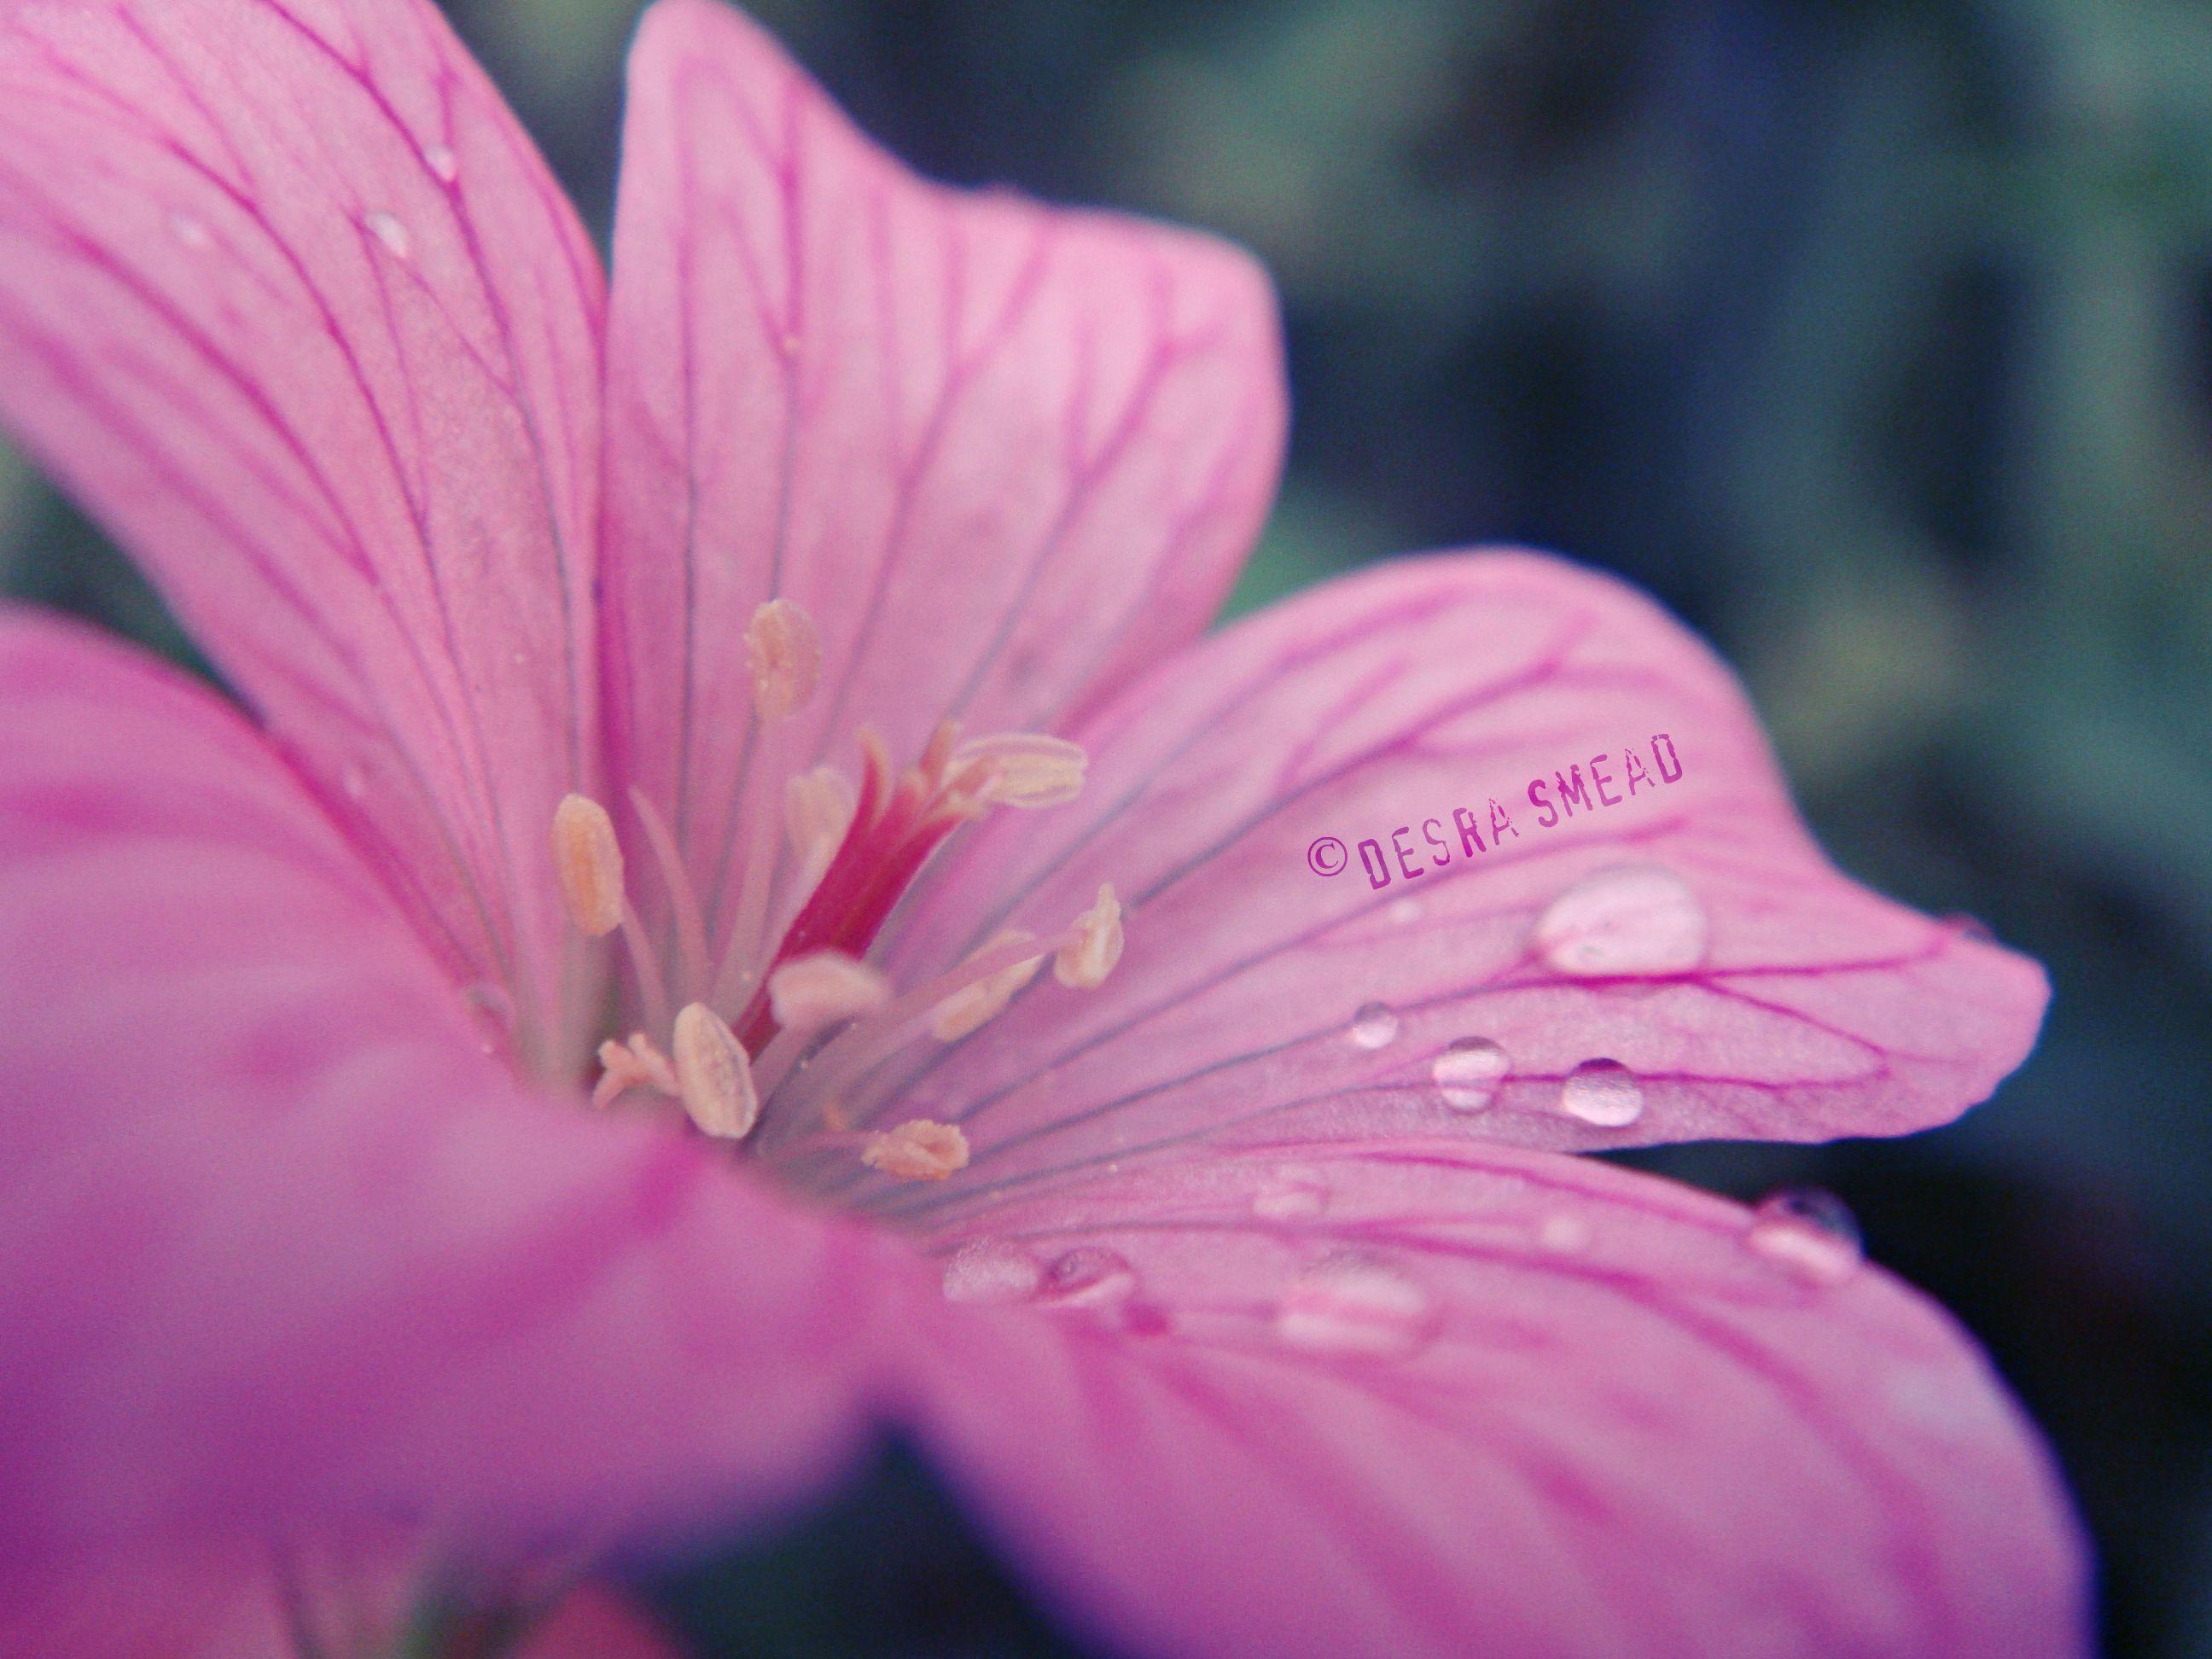 Rest in nature bathe in simplicity unatureus vibrationu by desra